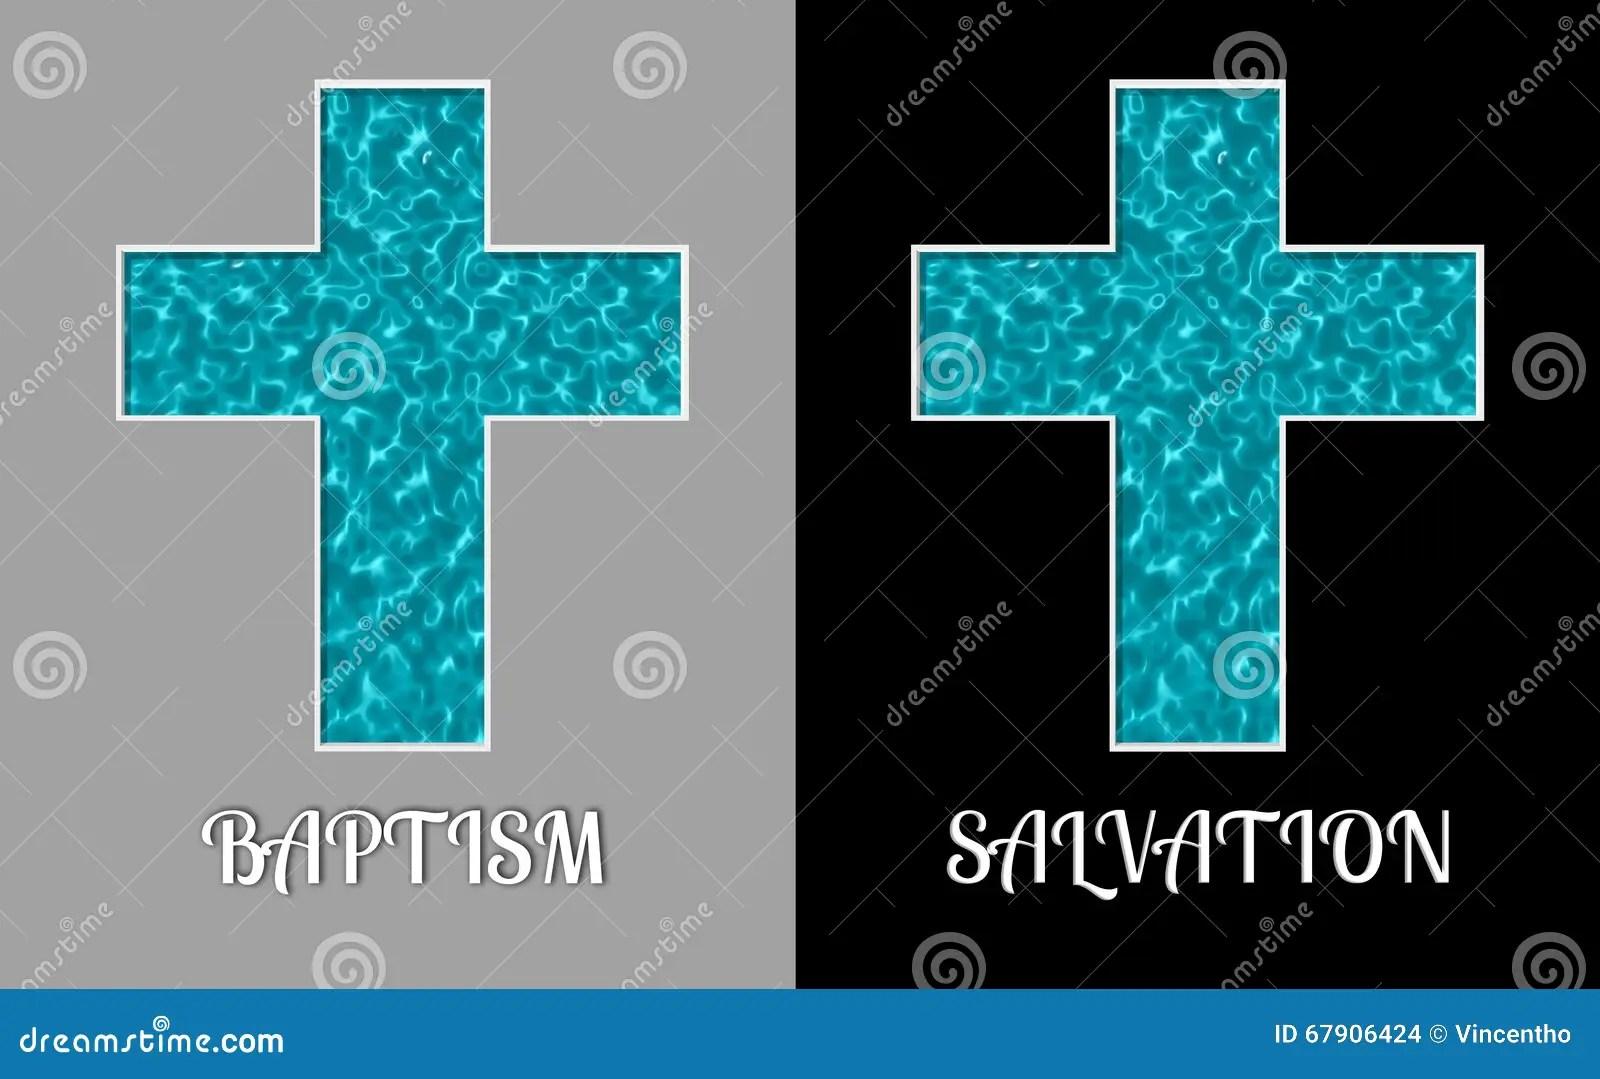 hight resolution of baptism salvation cross holy water pool illustration